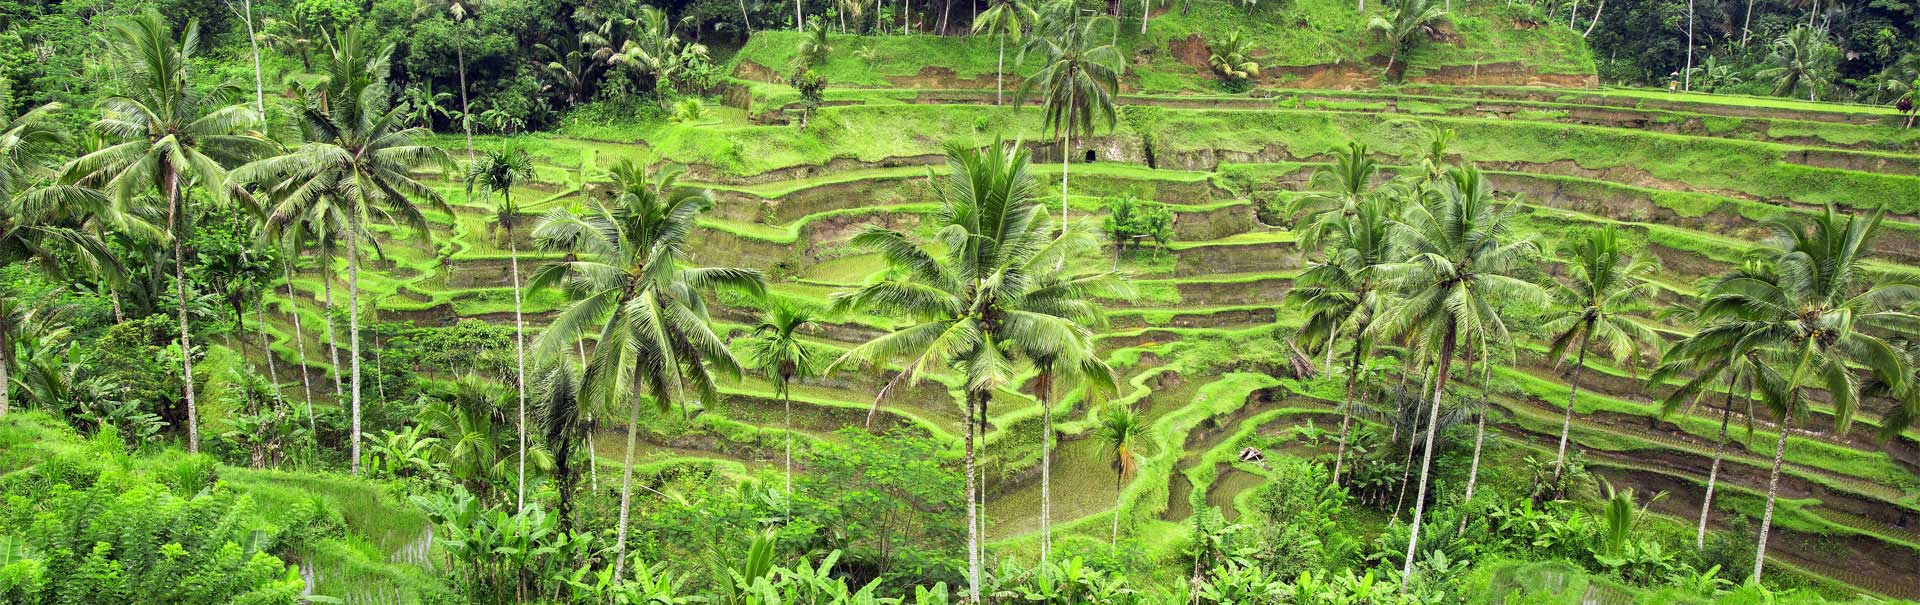 7 Days 6 Nights Bali Magic Family Tour Package Veena World